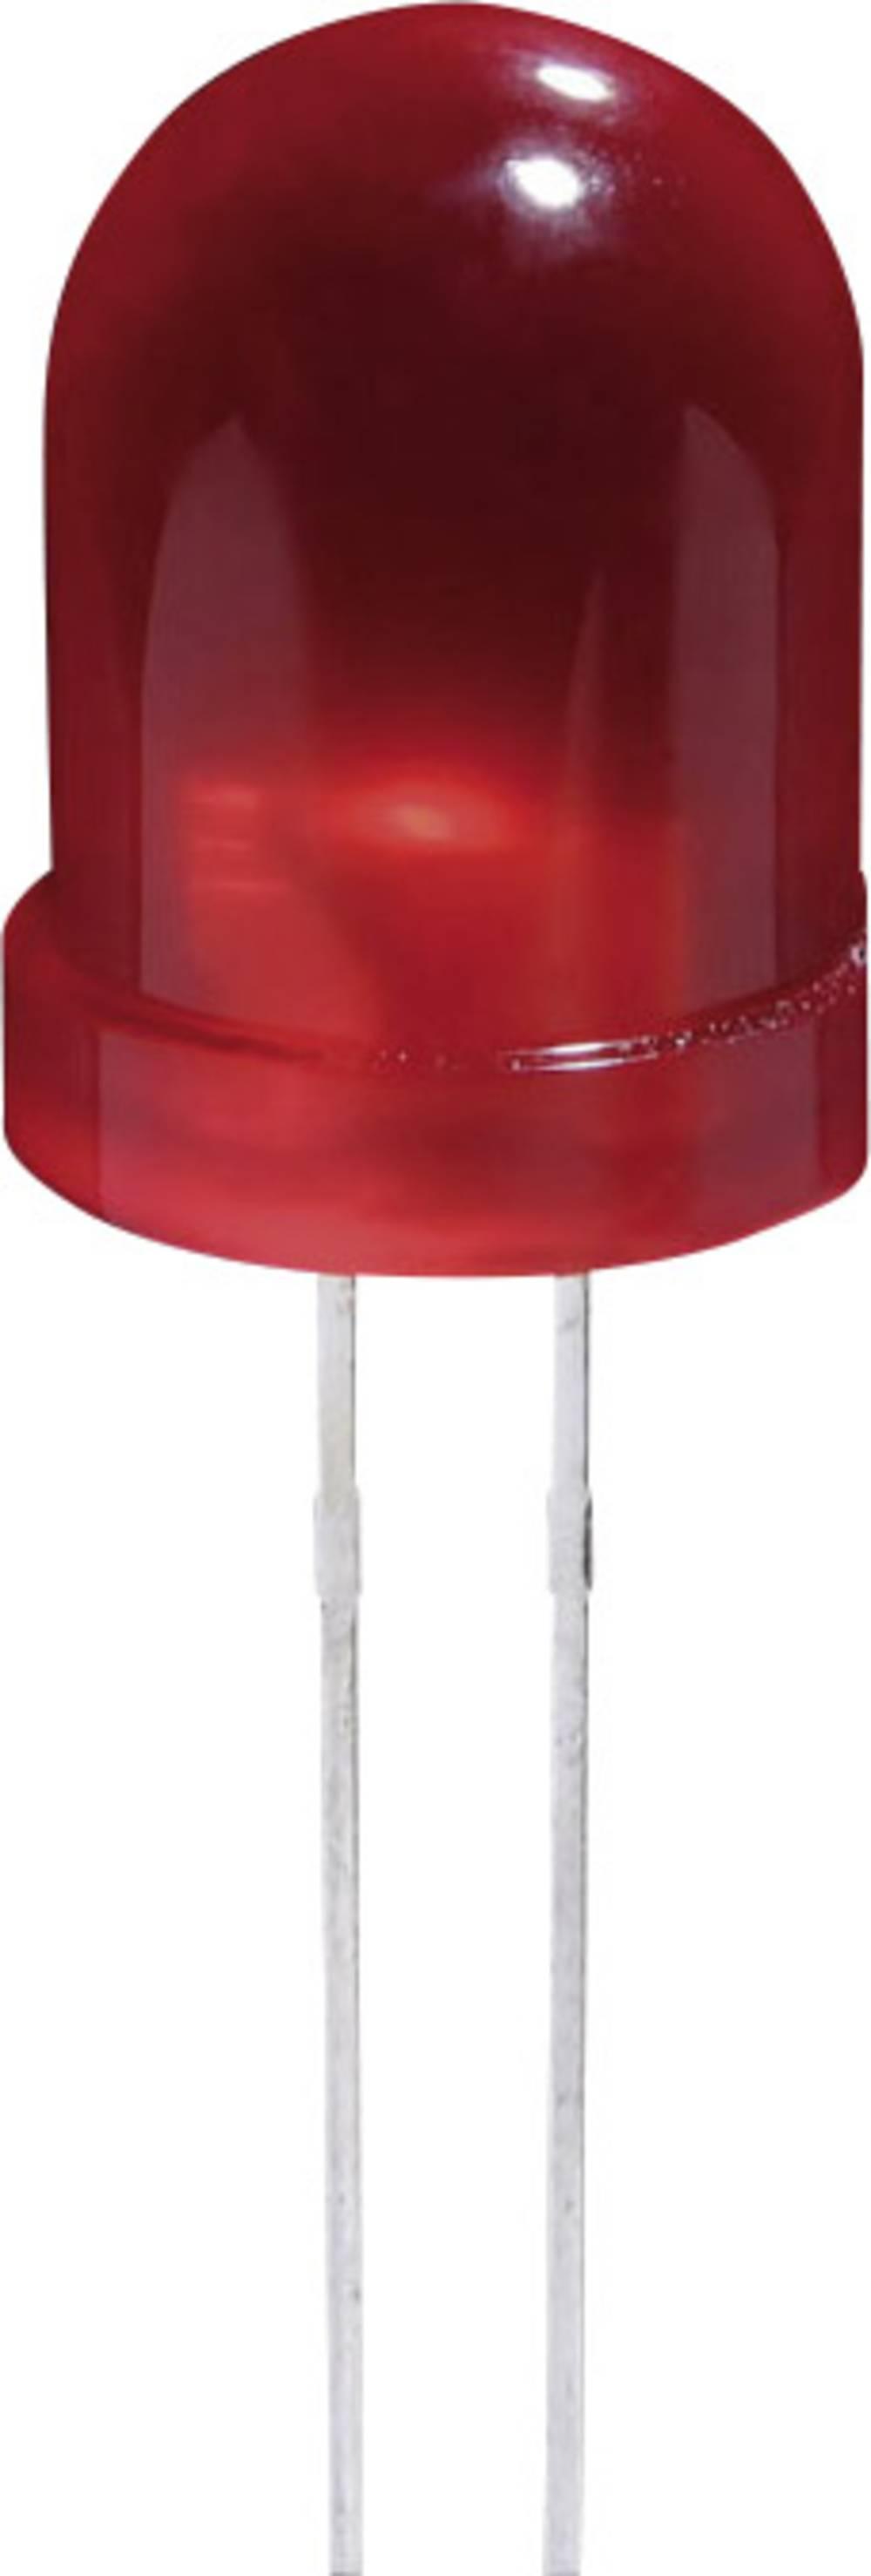 Ožičena LED dioda, rdeča, okrogla 8 mm 3 mcd 60 ° 20 mA 2 V L-793 ID